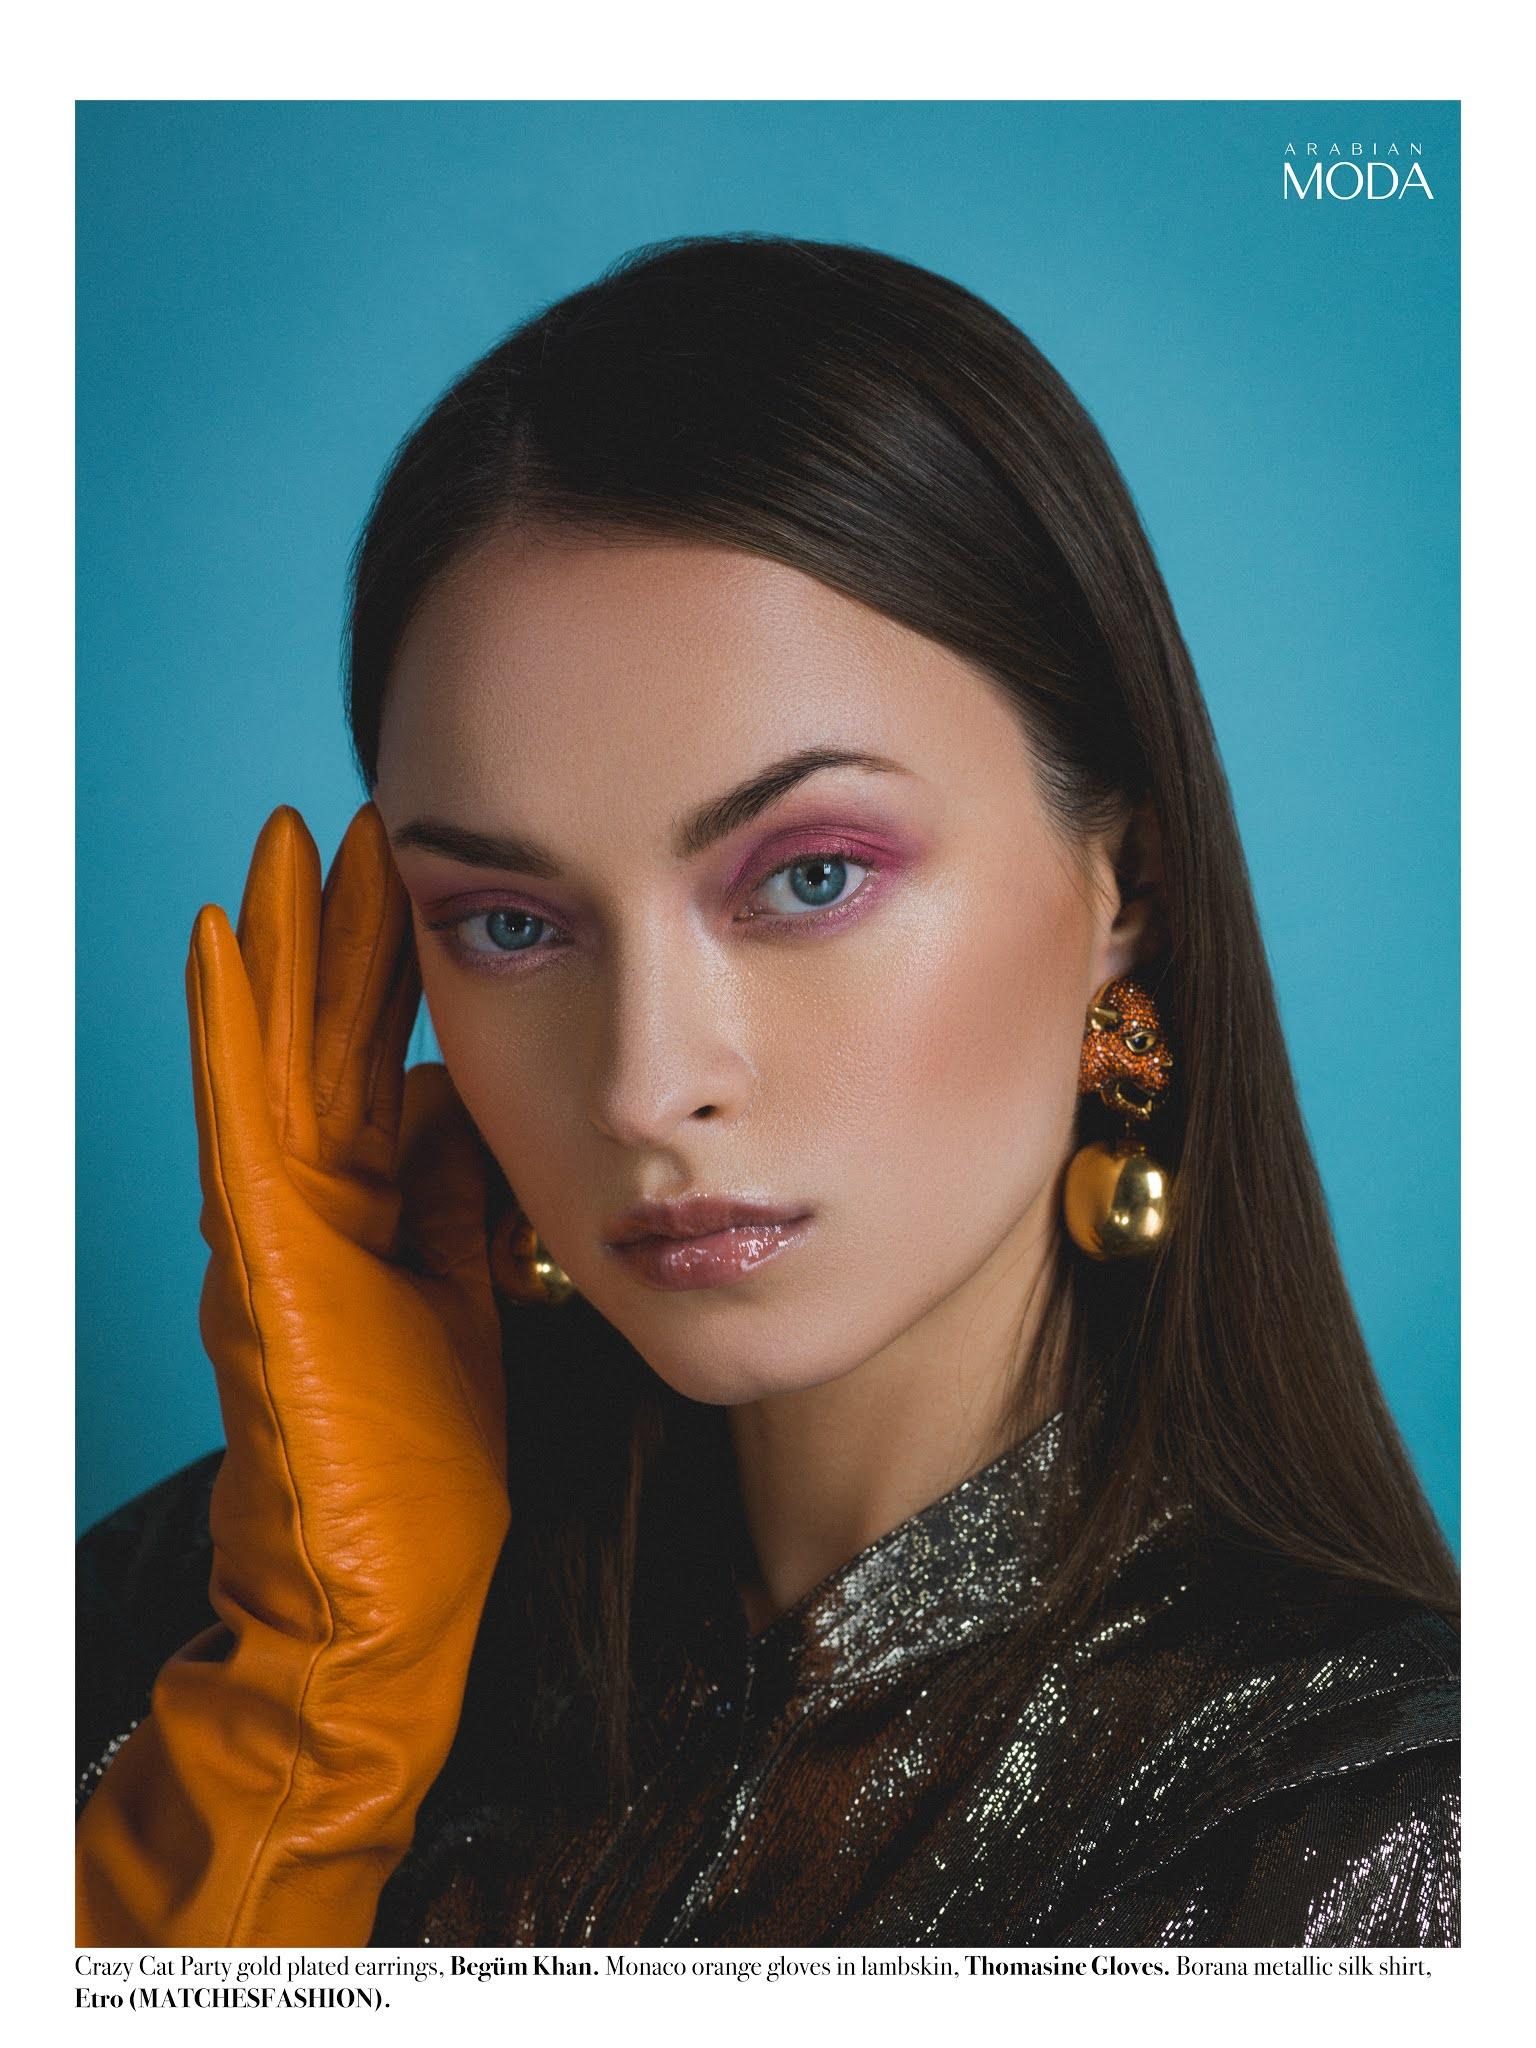 6- Arabian Moda x Etro x Begüm Khan x Thomasine Gloves